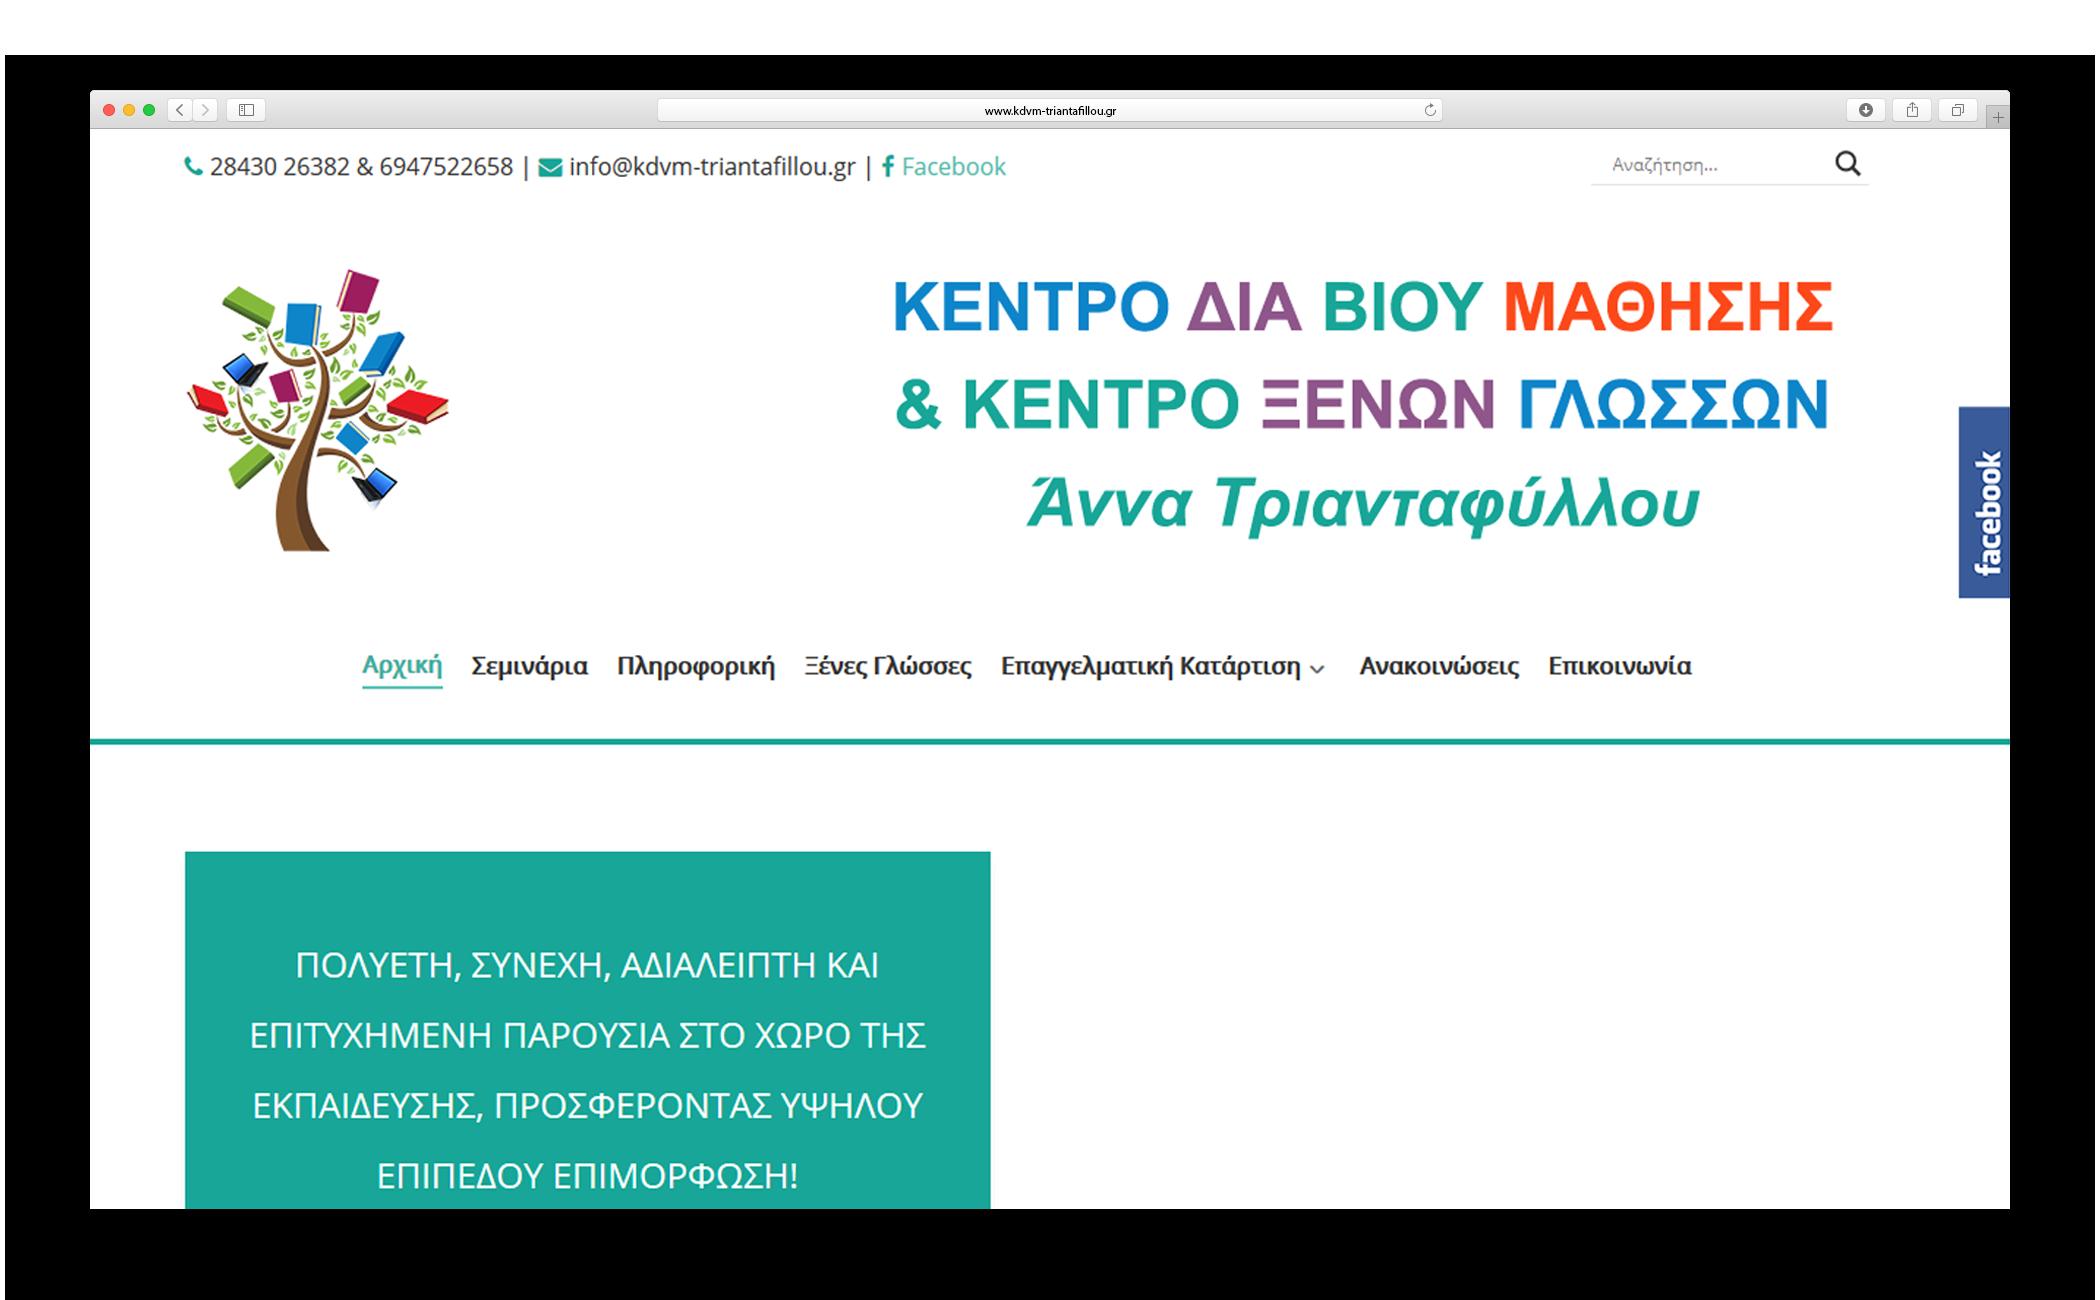 kdvm-triantafillou-article-view